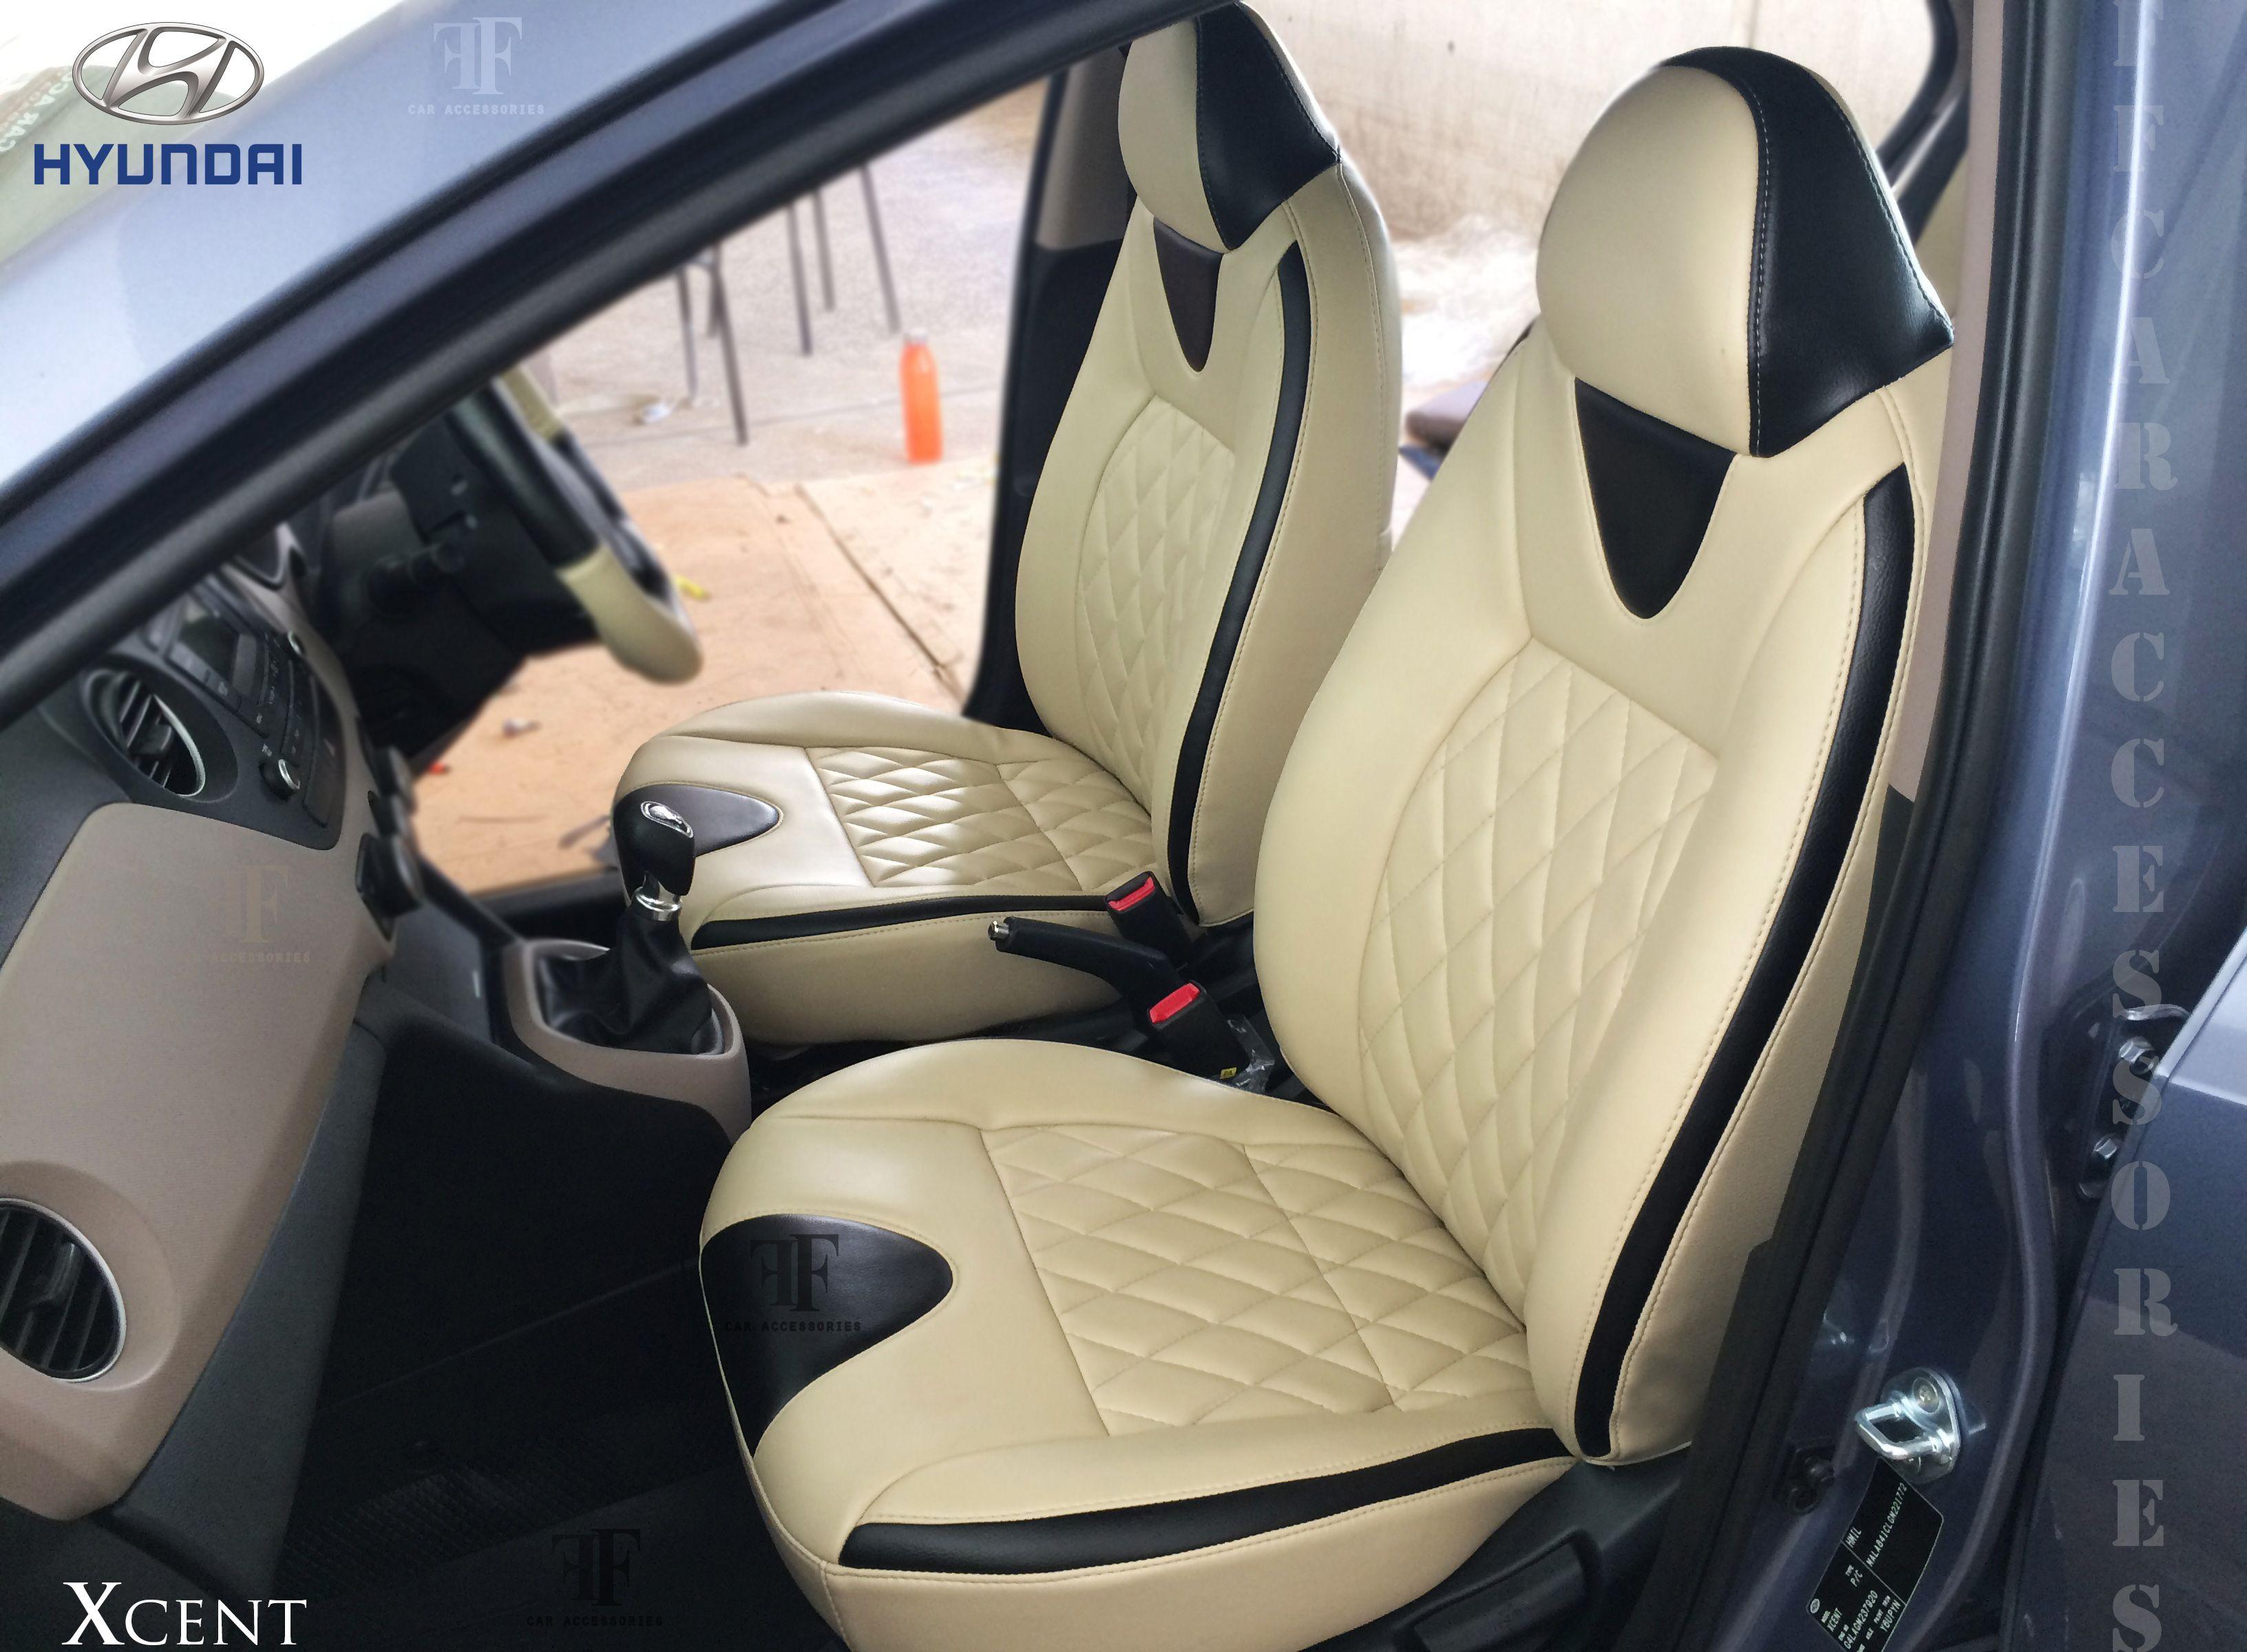 and classy elantra sedan madison tech brings led updates features pricing hyundai photos